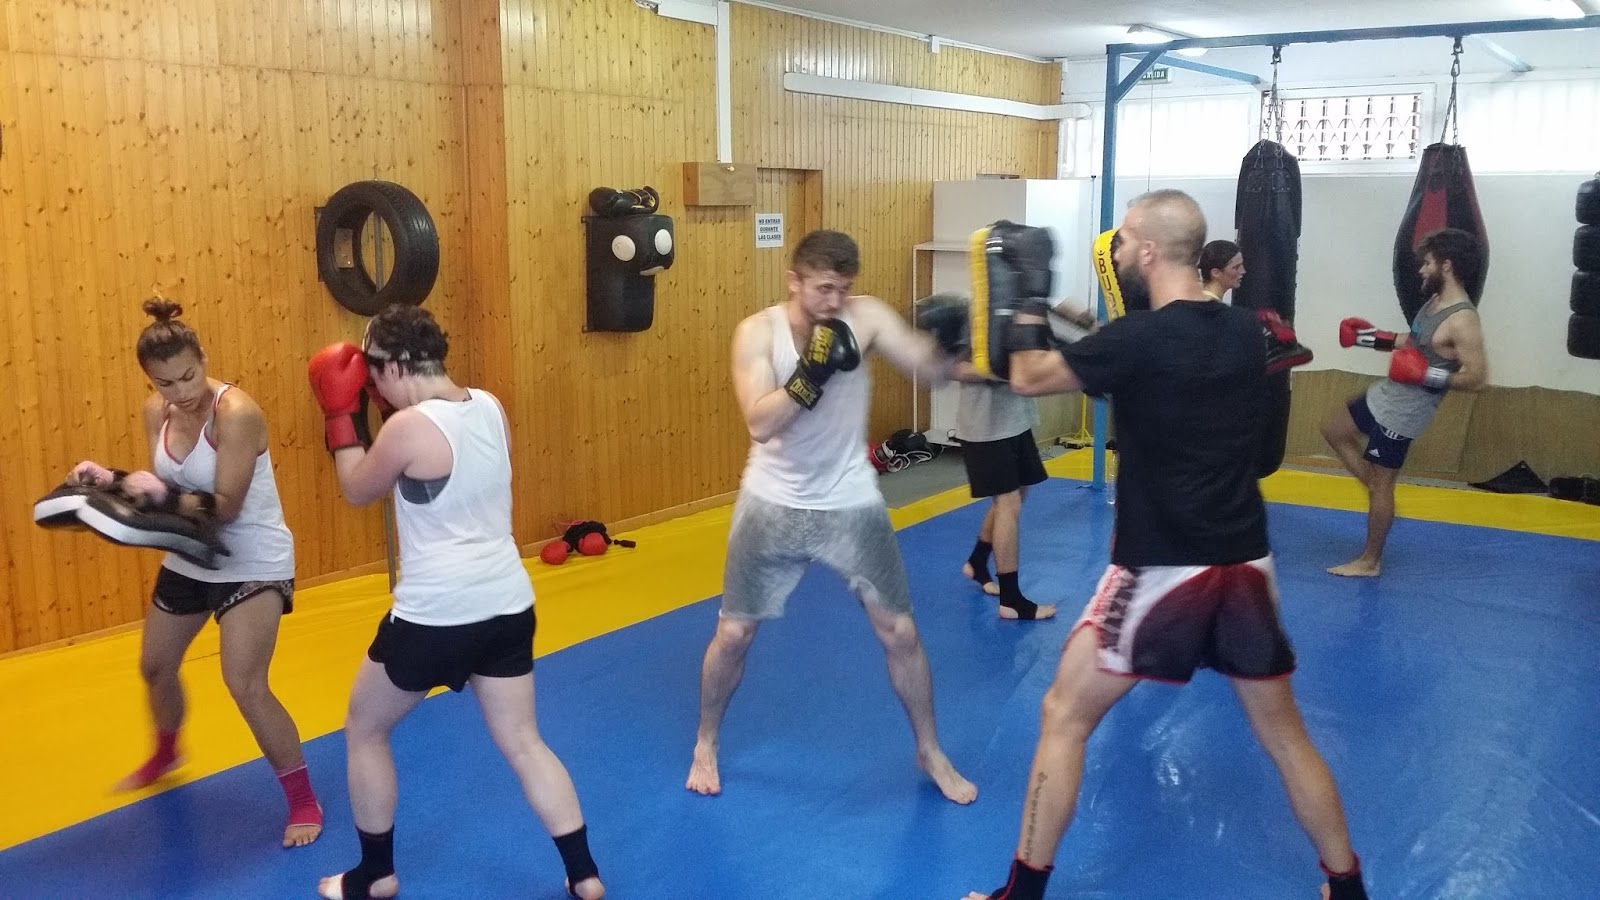 Budokan blog de artes marciales el kick boxing siempre - Artes marciales sevilla ...